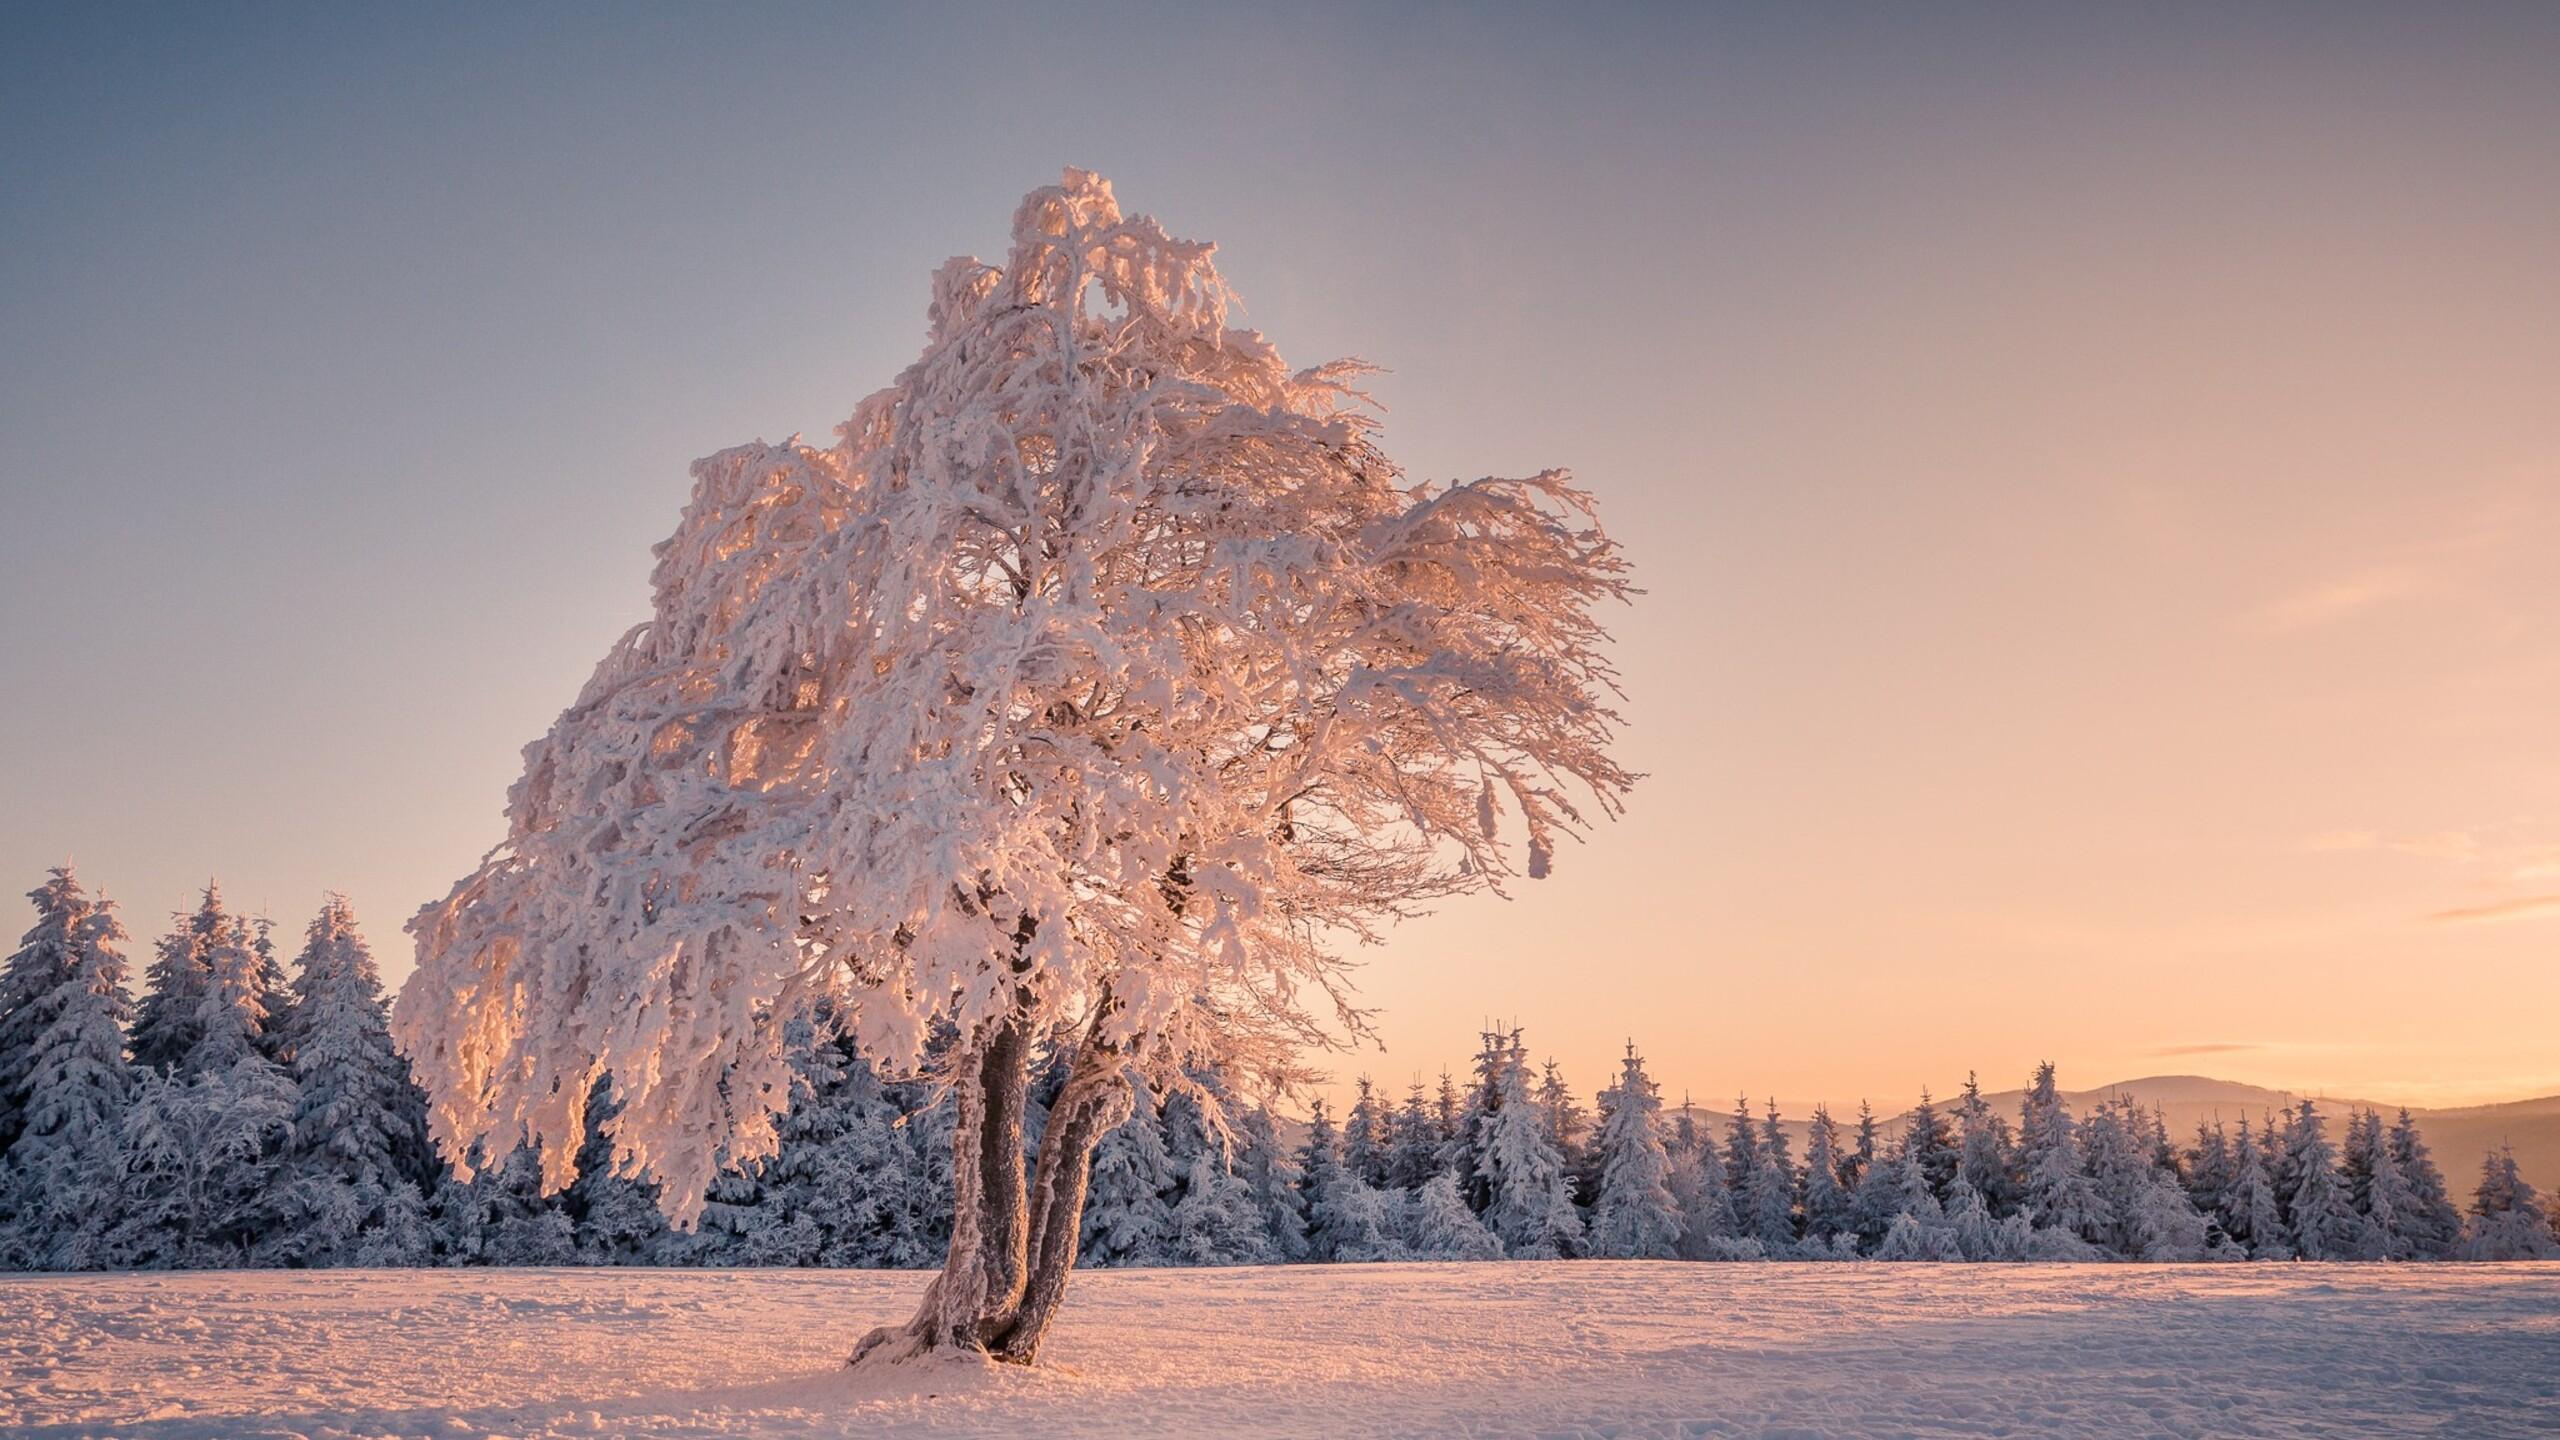 снег зима лучи деревья snow winter rays trees скачать